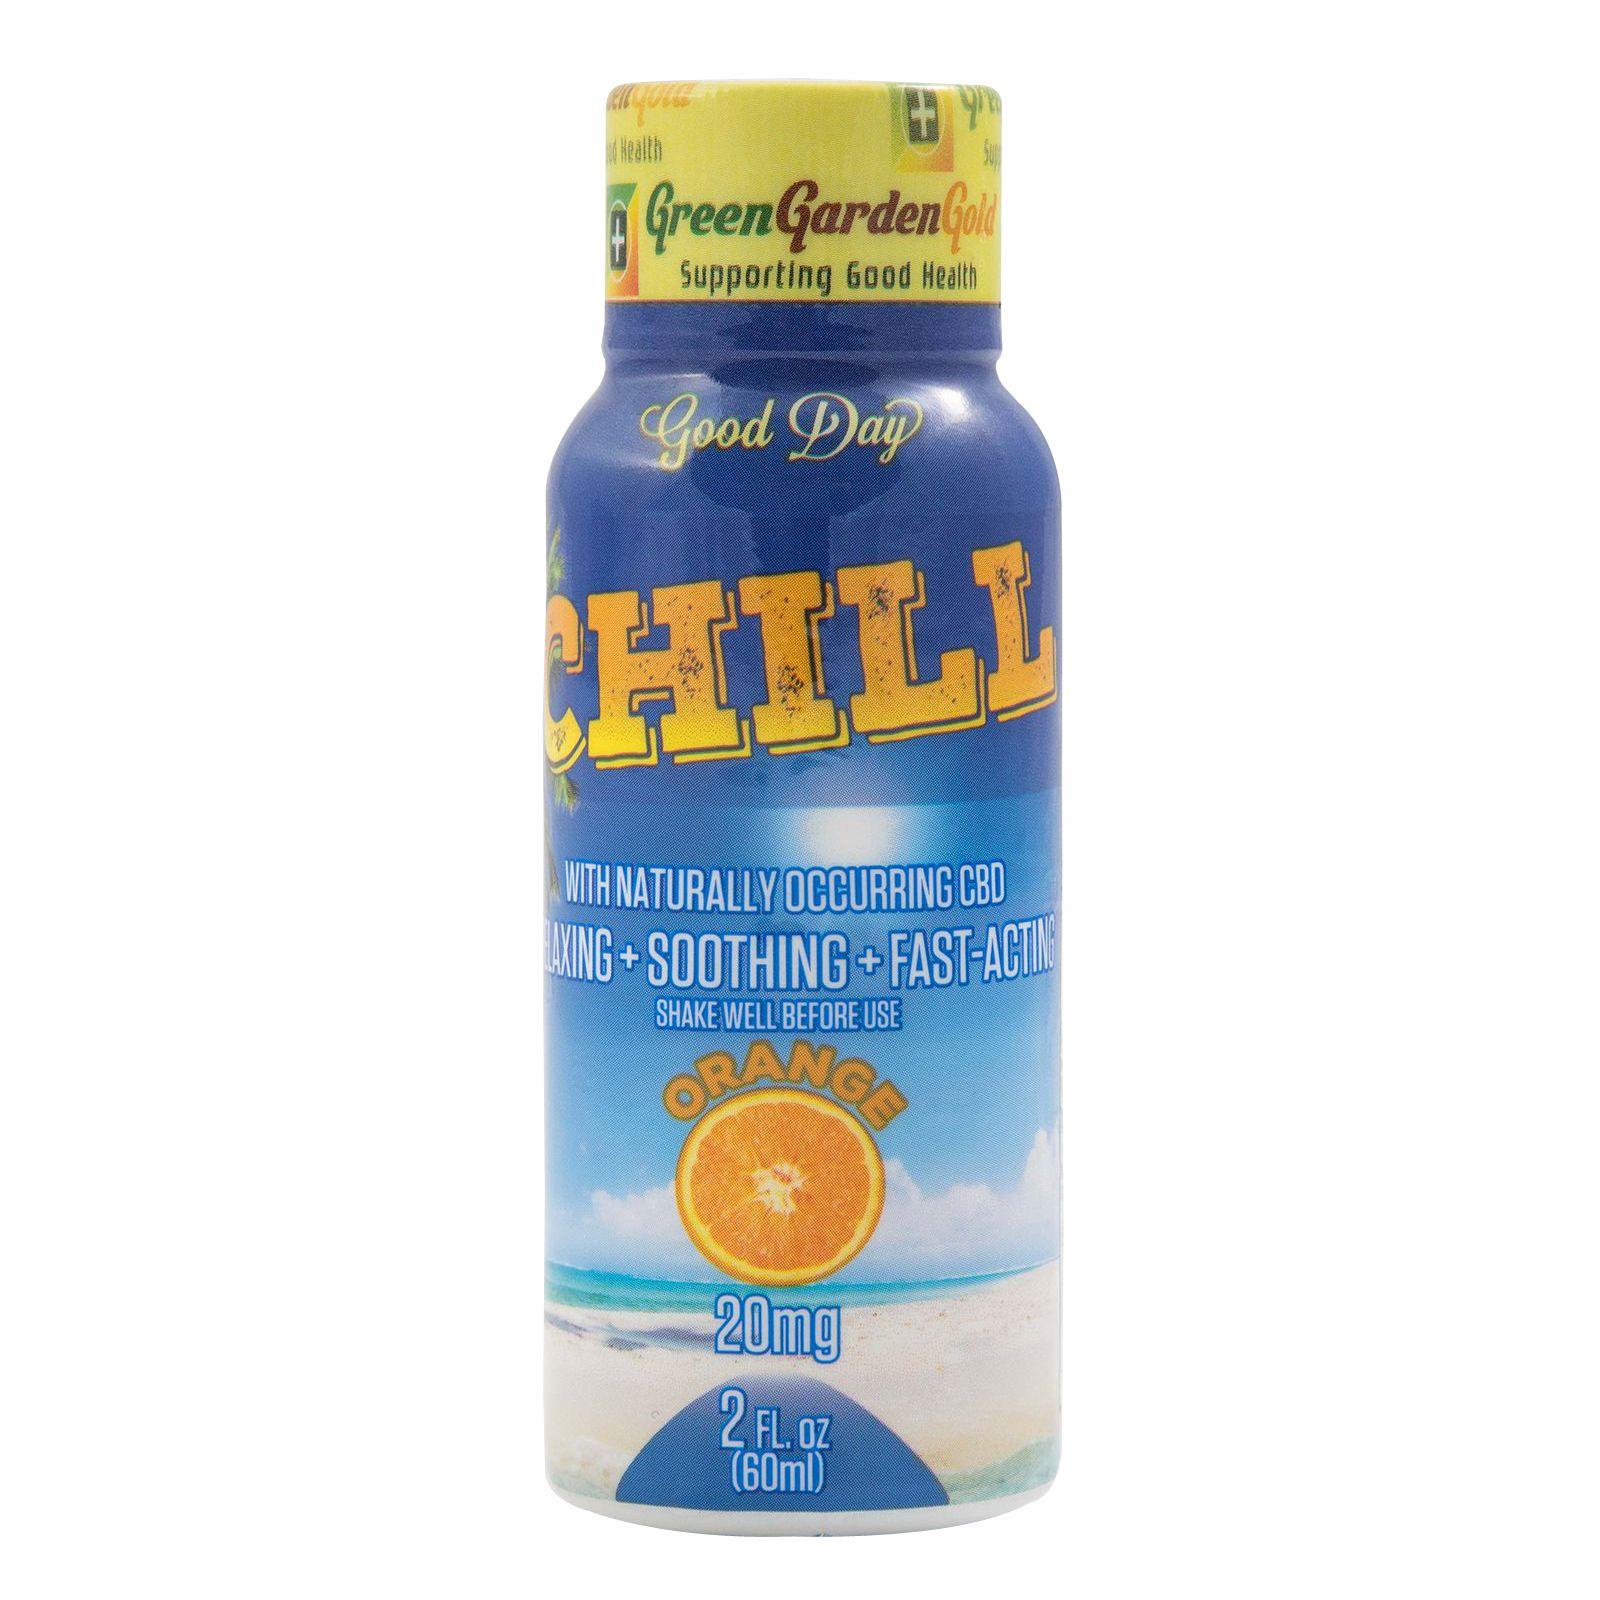 CBD Oil Concentrated Shot Orange 20 mg 2 fl. oz. (59 mL)